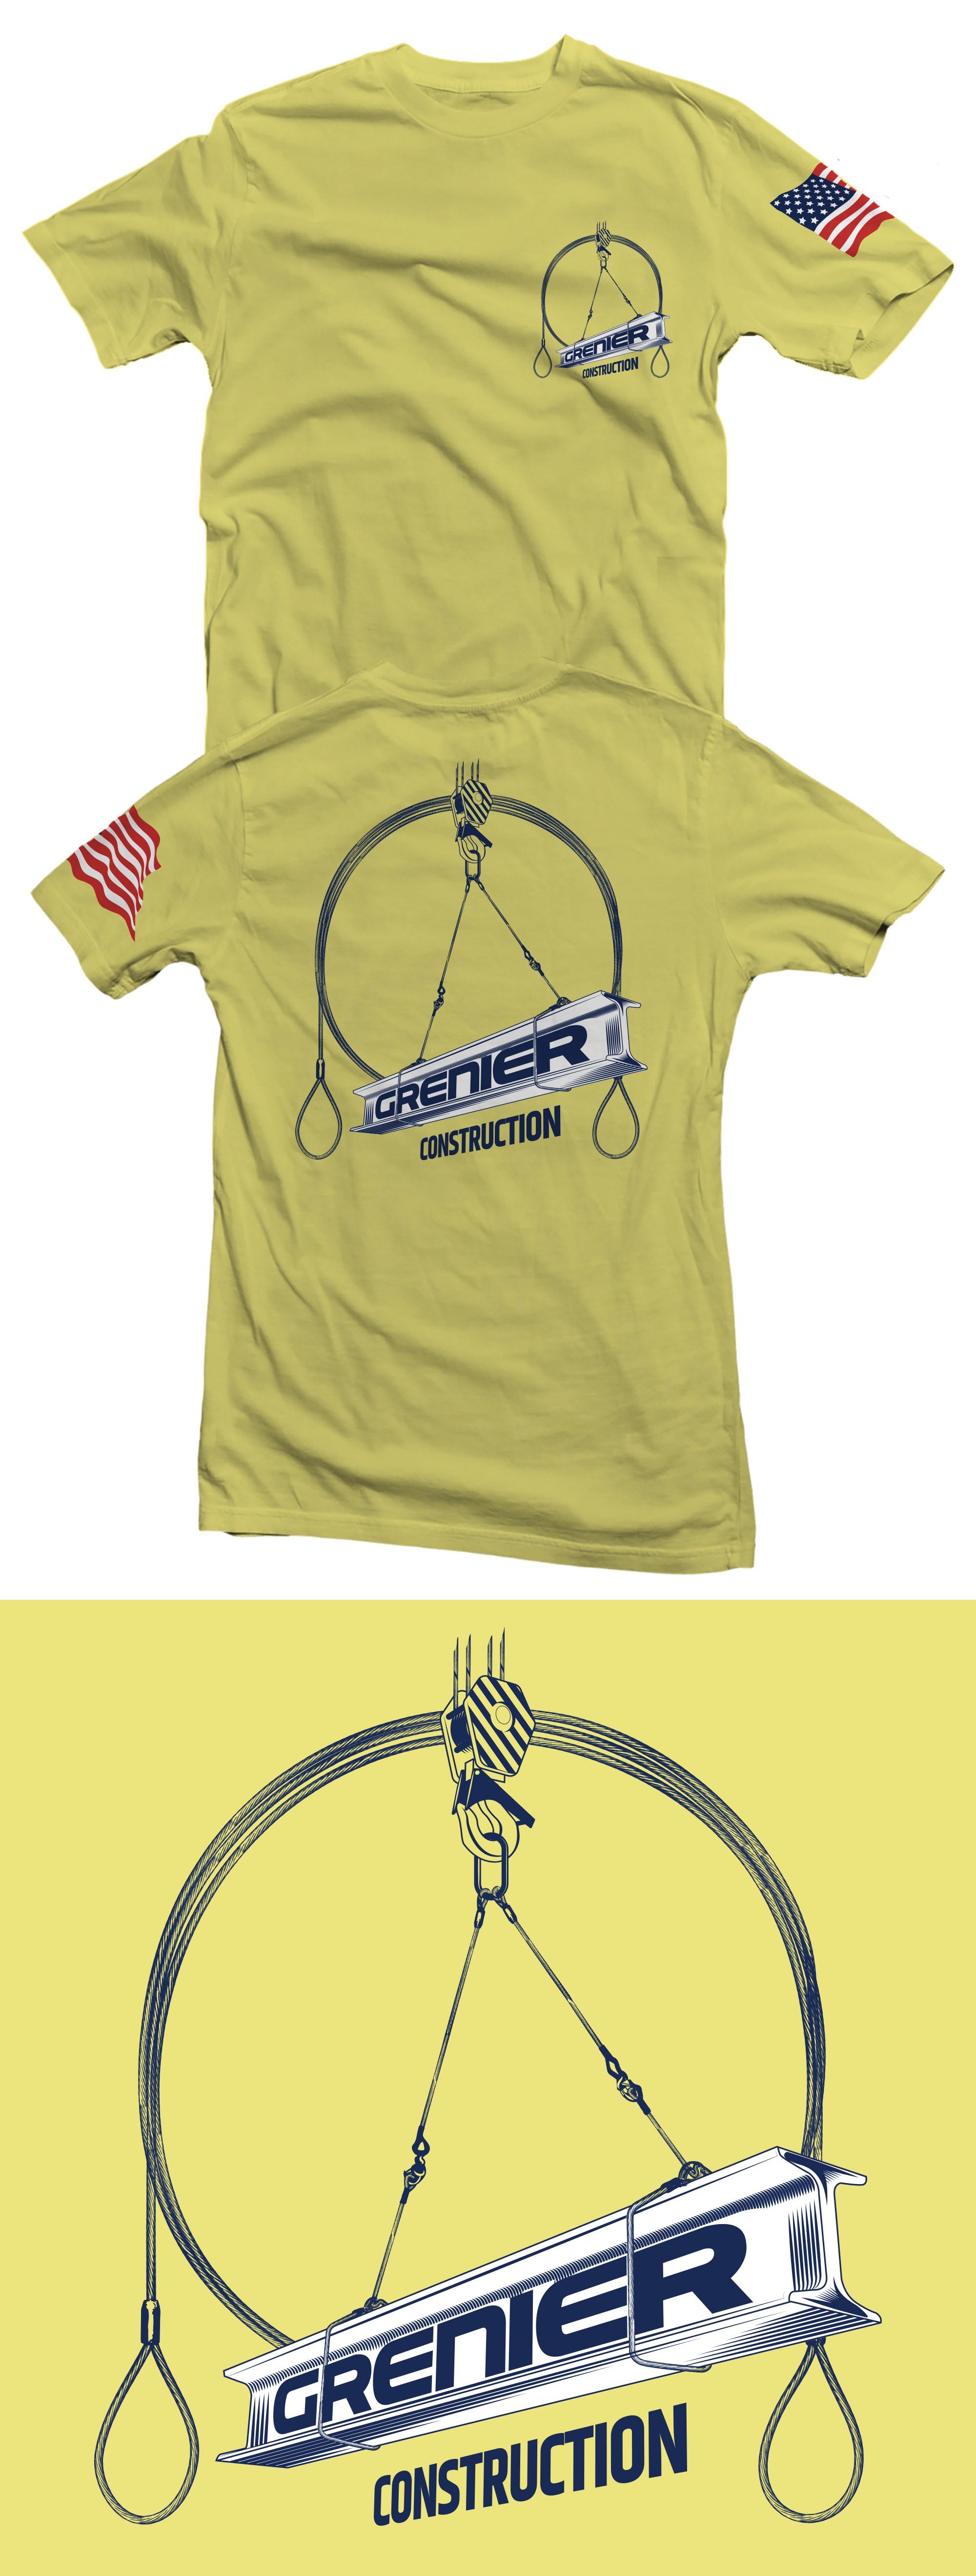 Grenier Construction shirt design